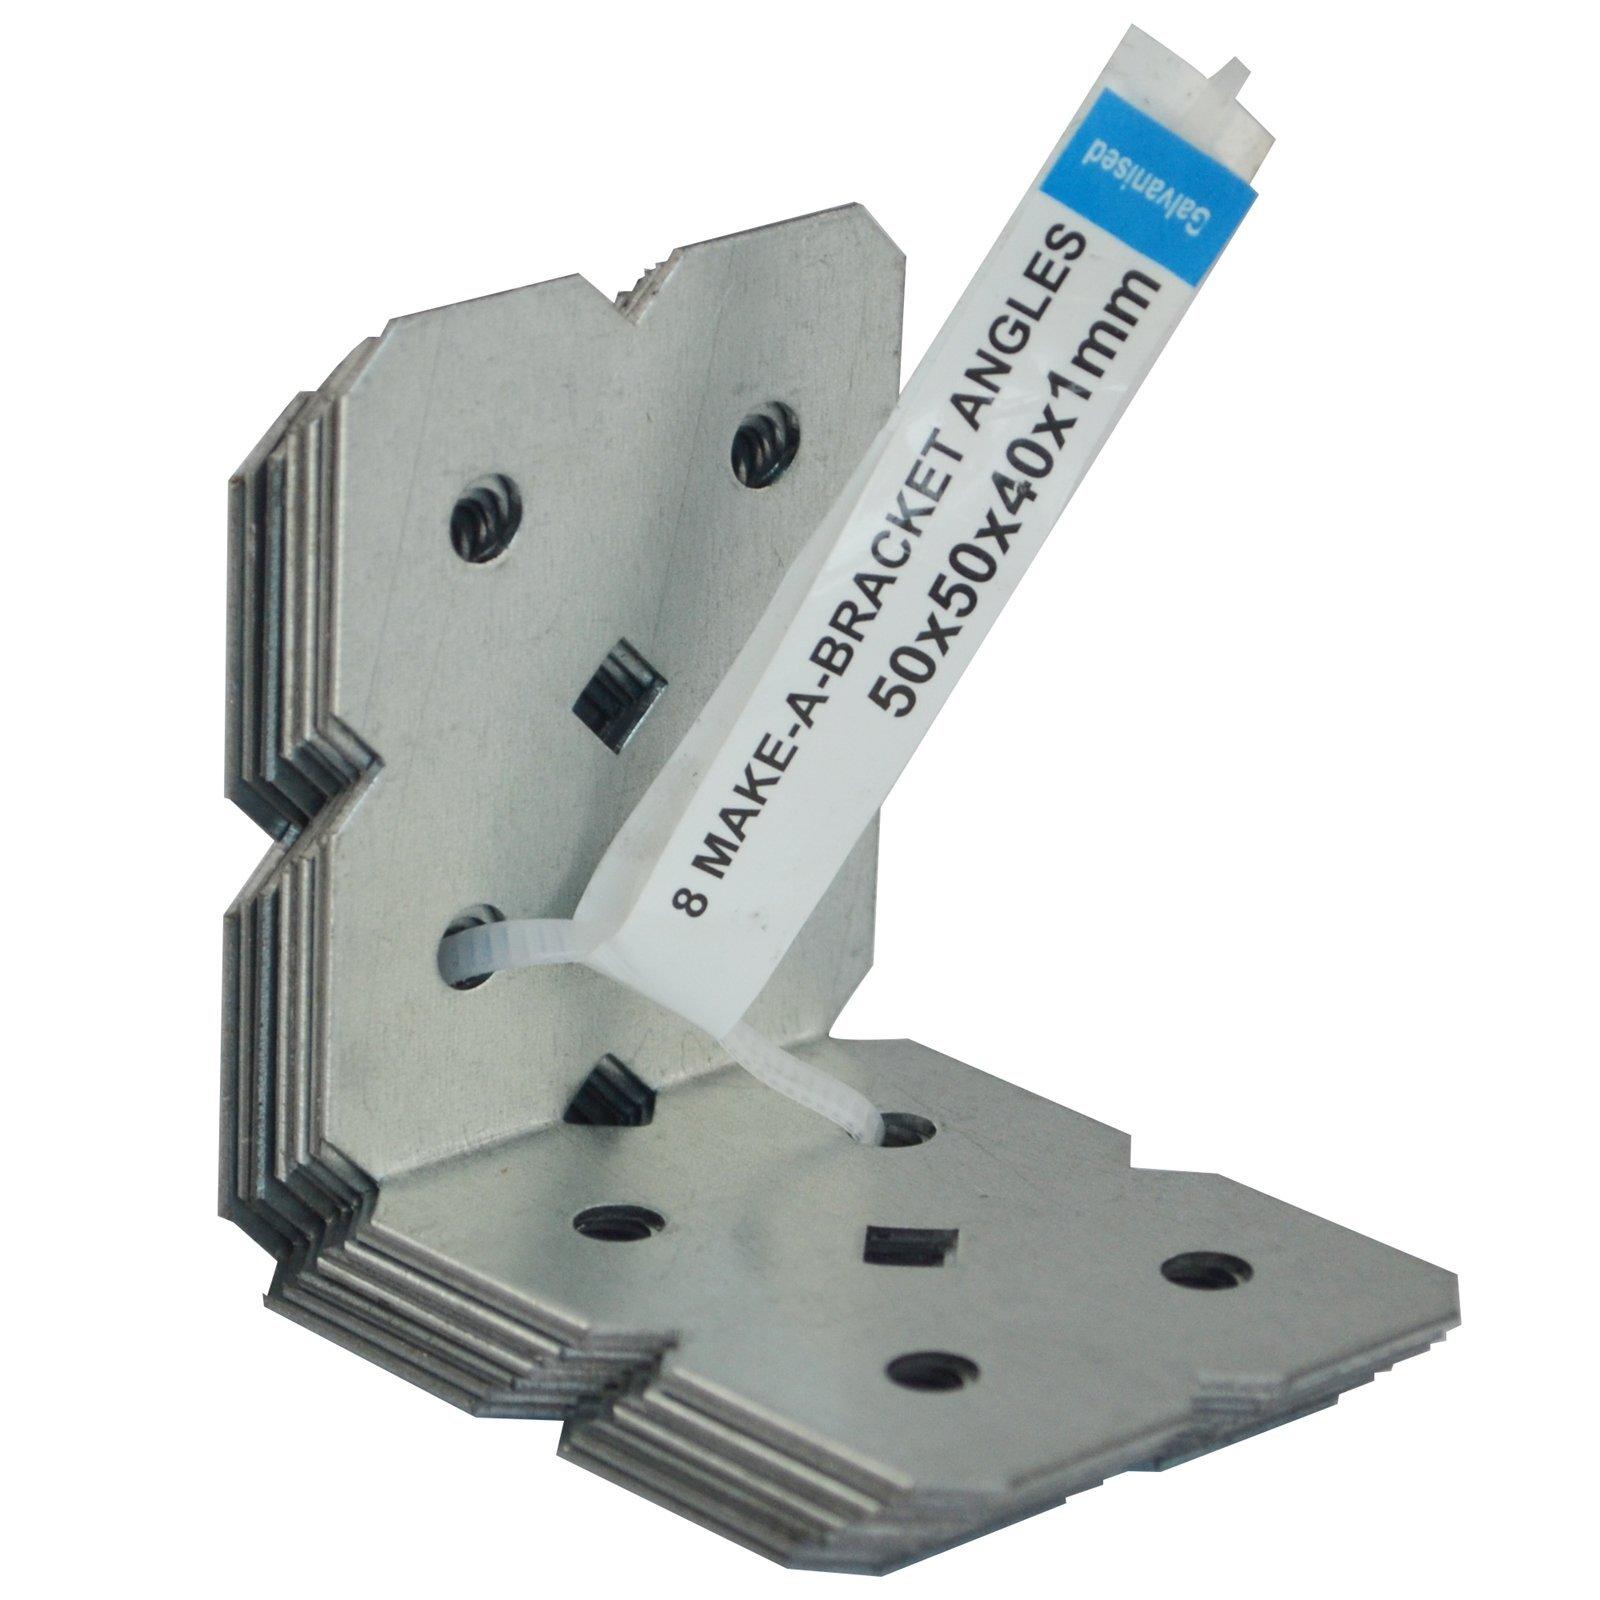 Carinya 50 x 50 x 40 x 1mm Galvanised Angle Bracket - 8 Pack